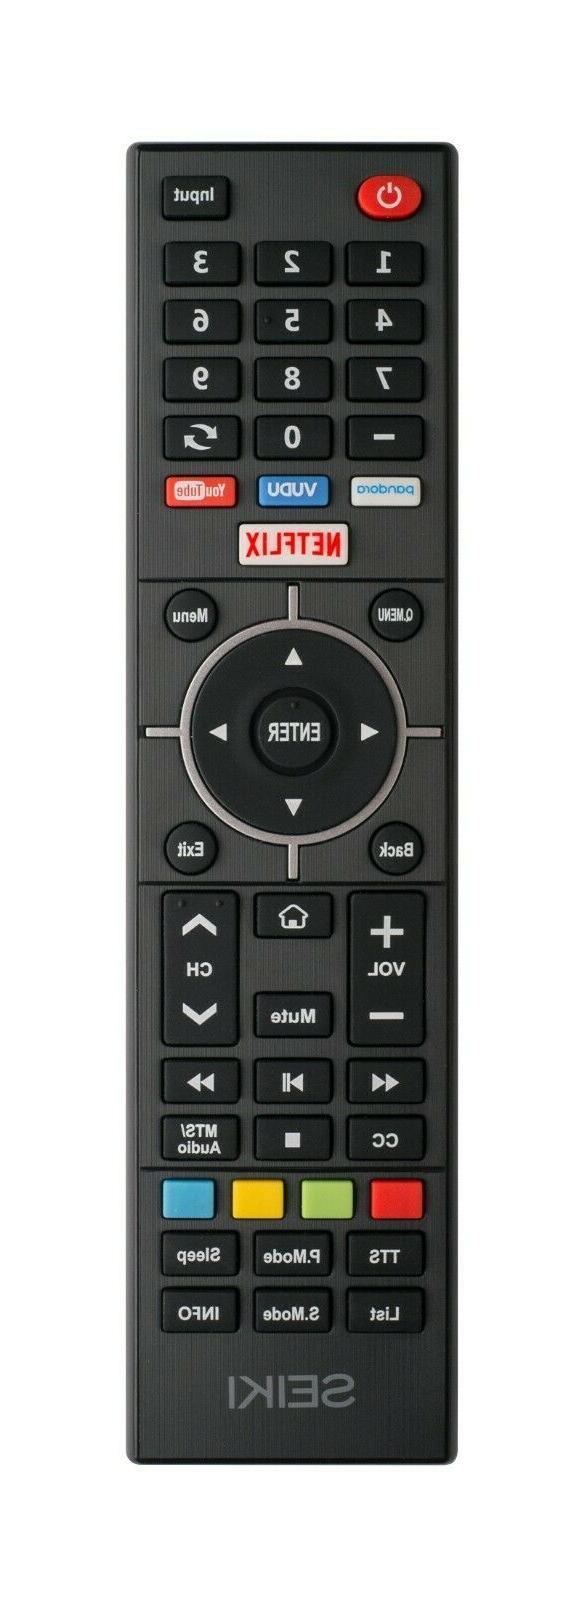 60 HD 2160p Video, Smart TV HDMI